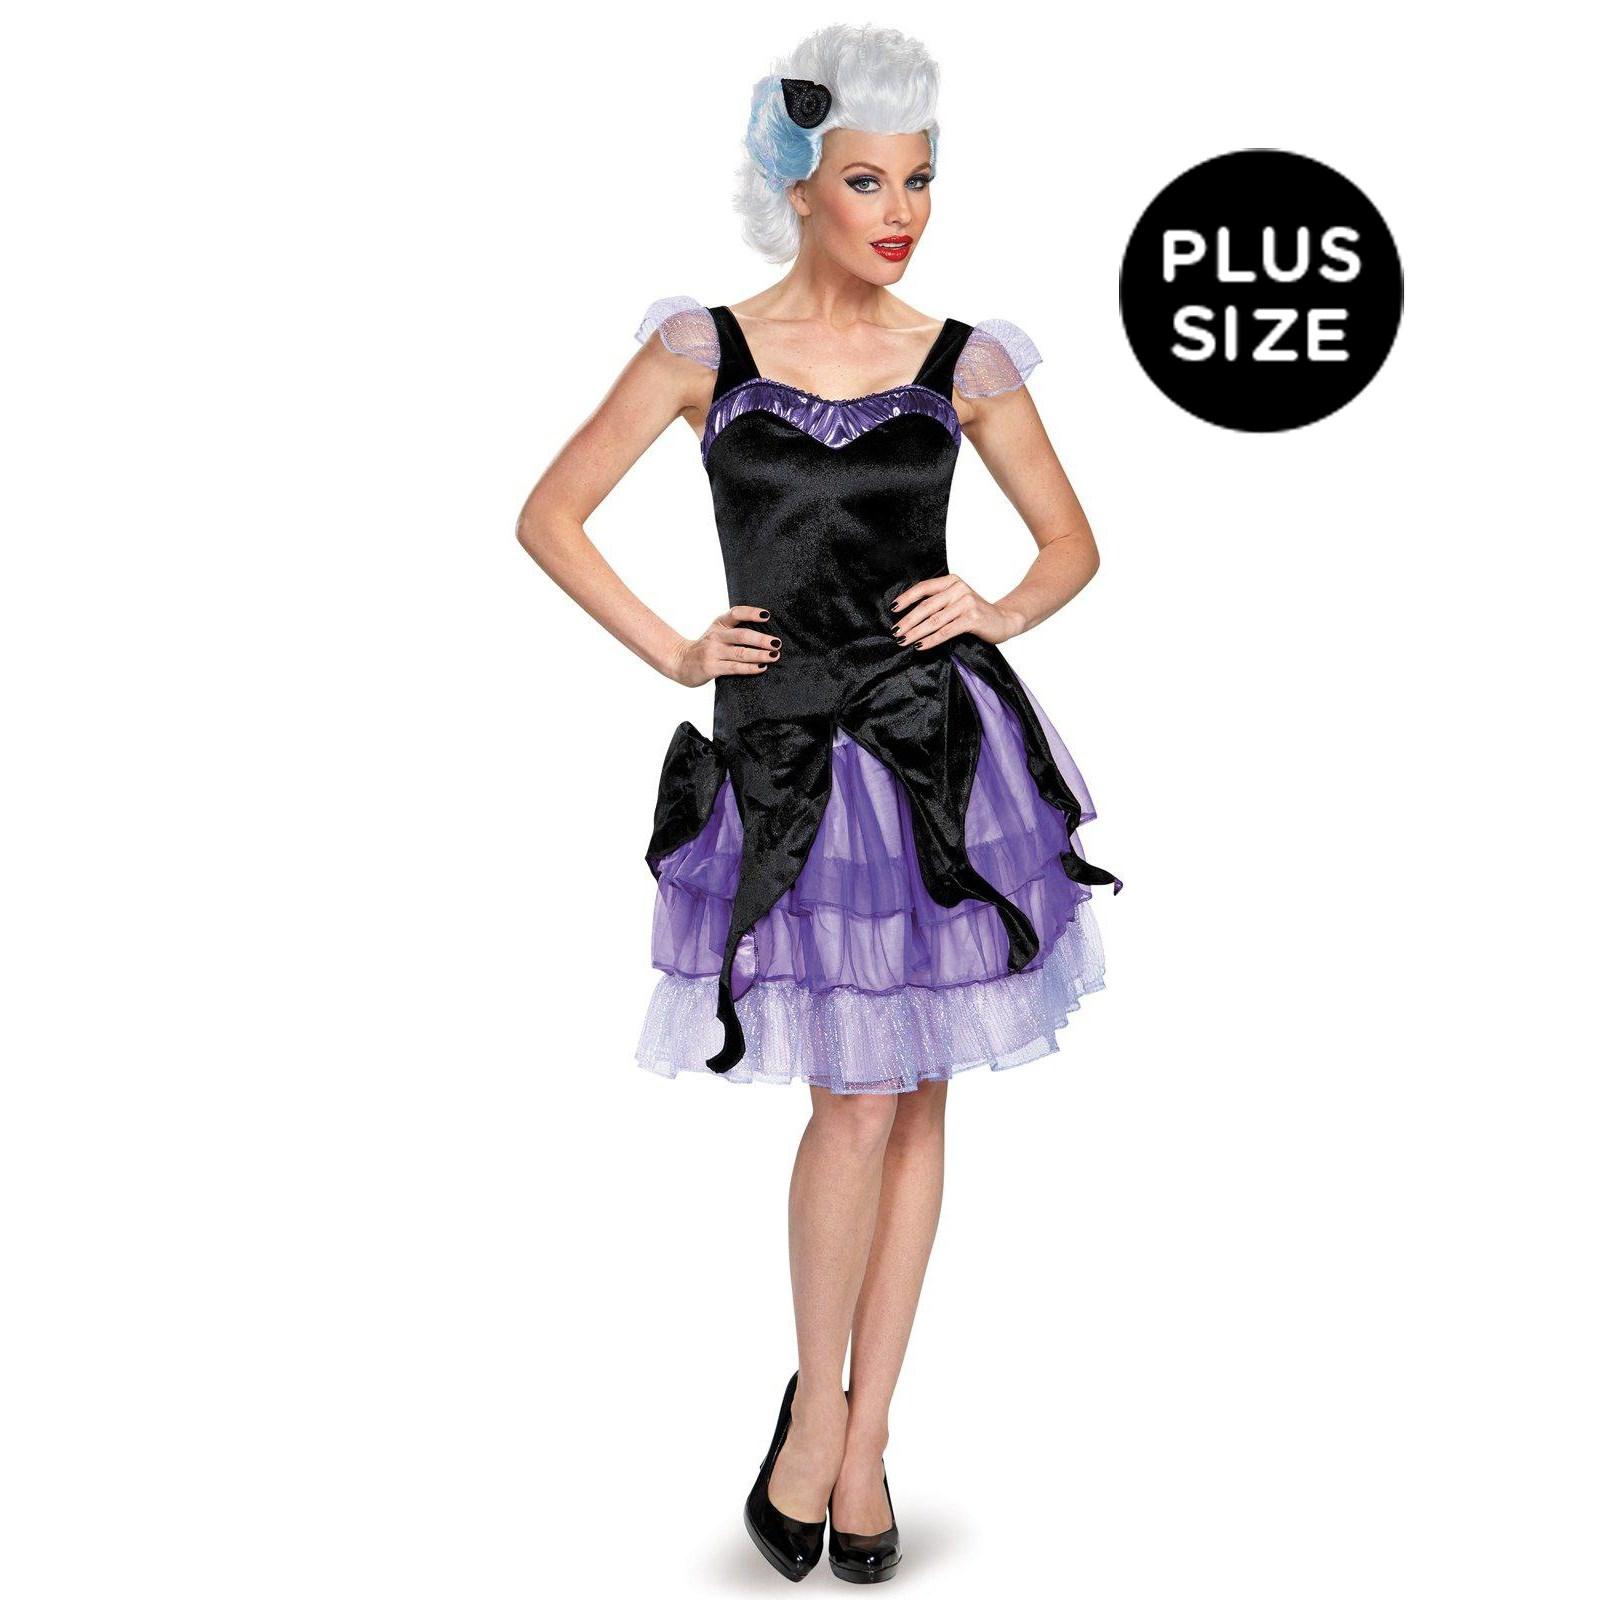 Disney Deluxe Ursula Plus Size Costume For Women | BuyCostumes.com